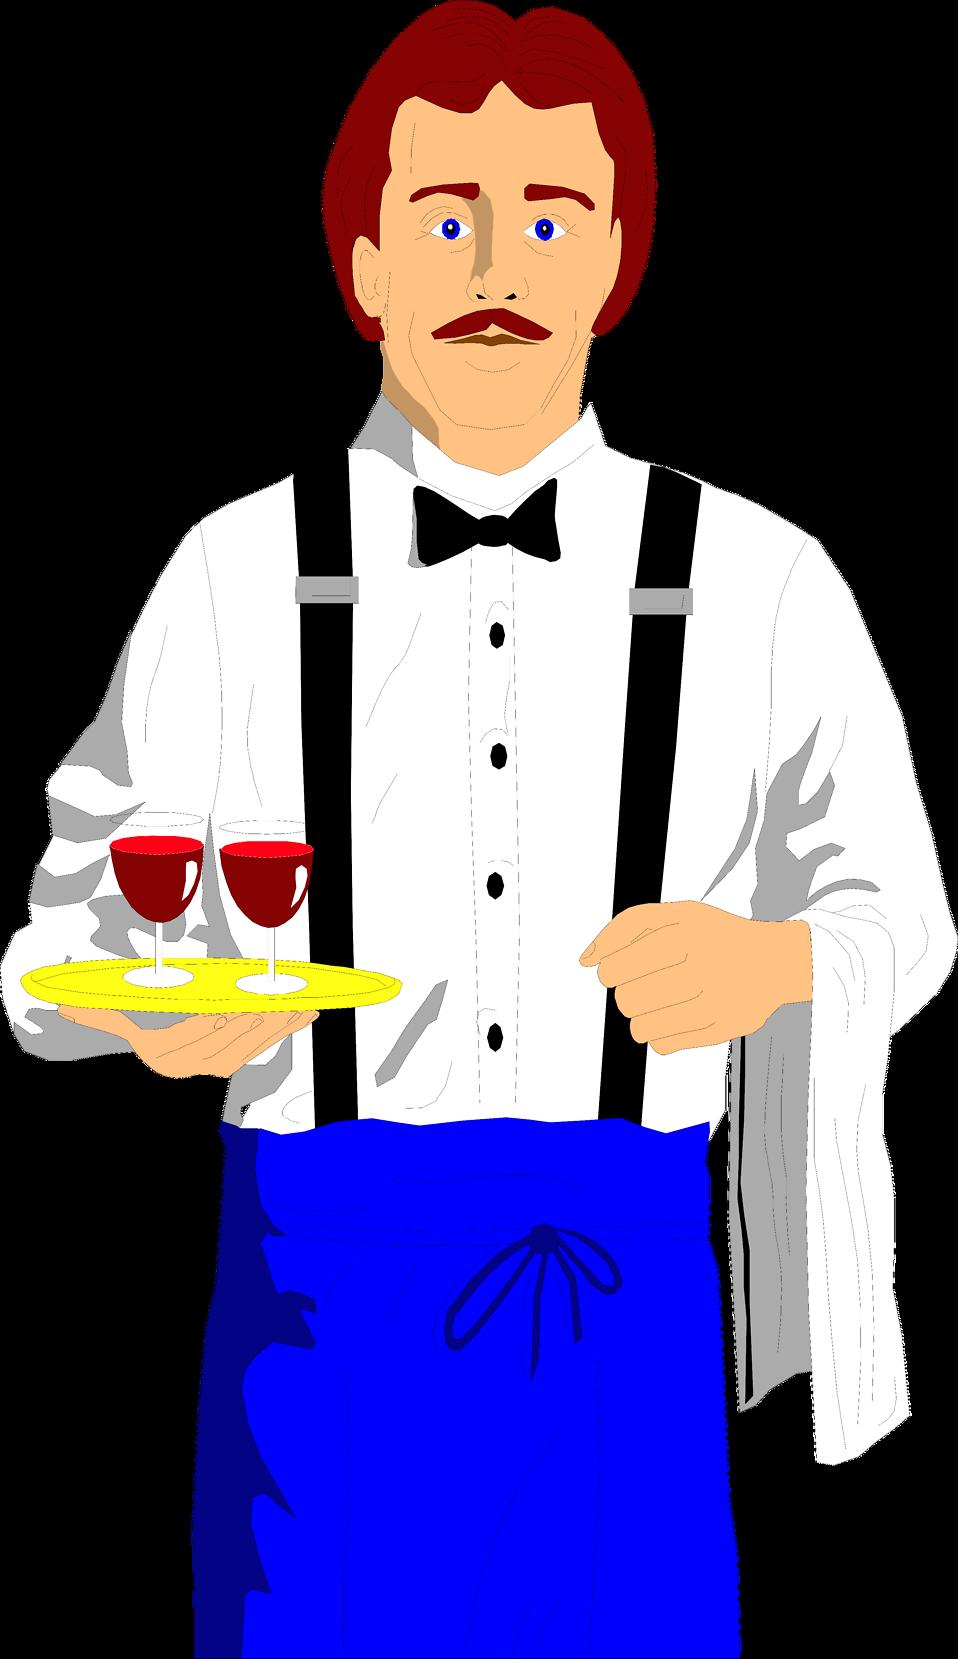 Waitress clipart food service. Waiter free stock photo